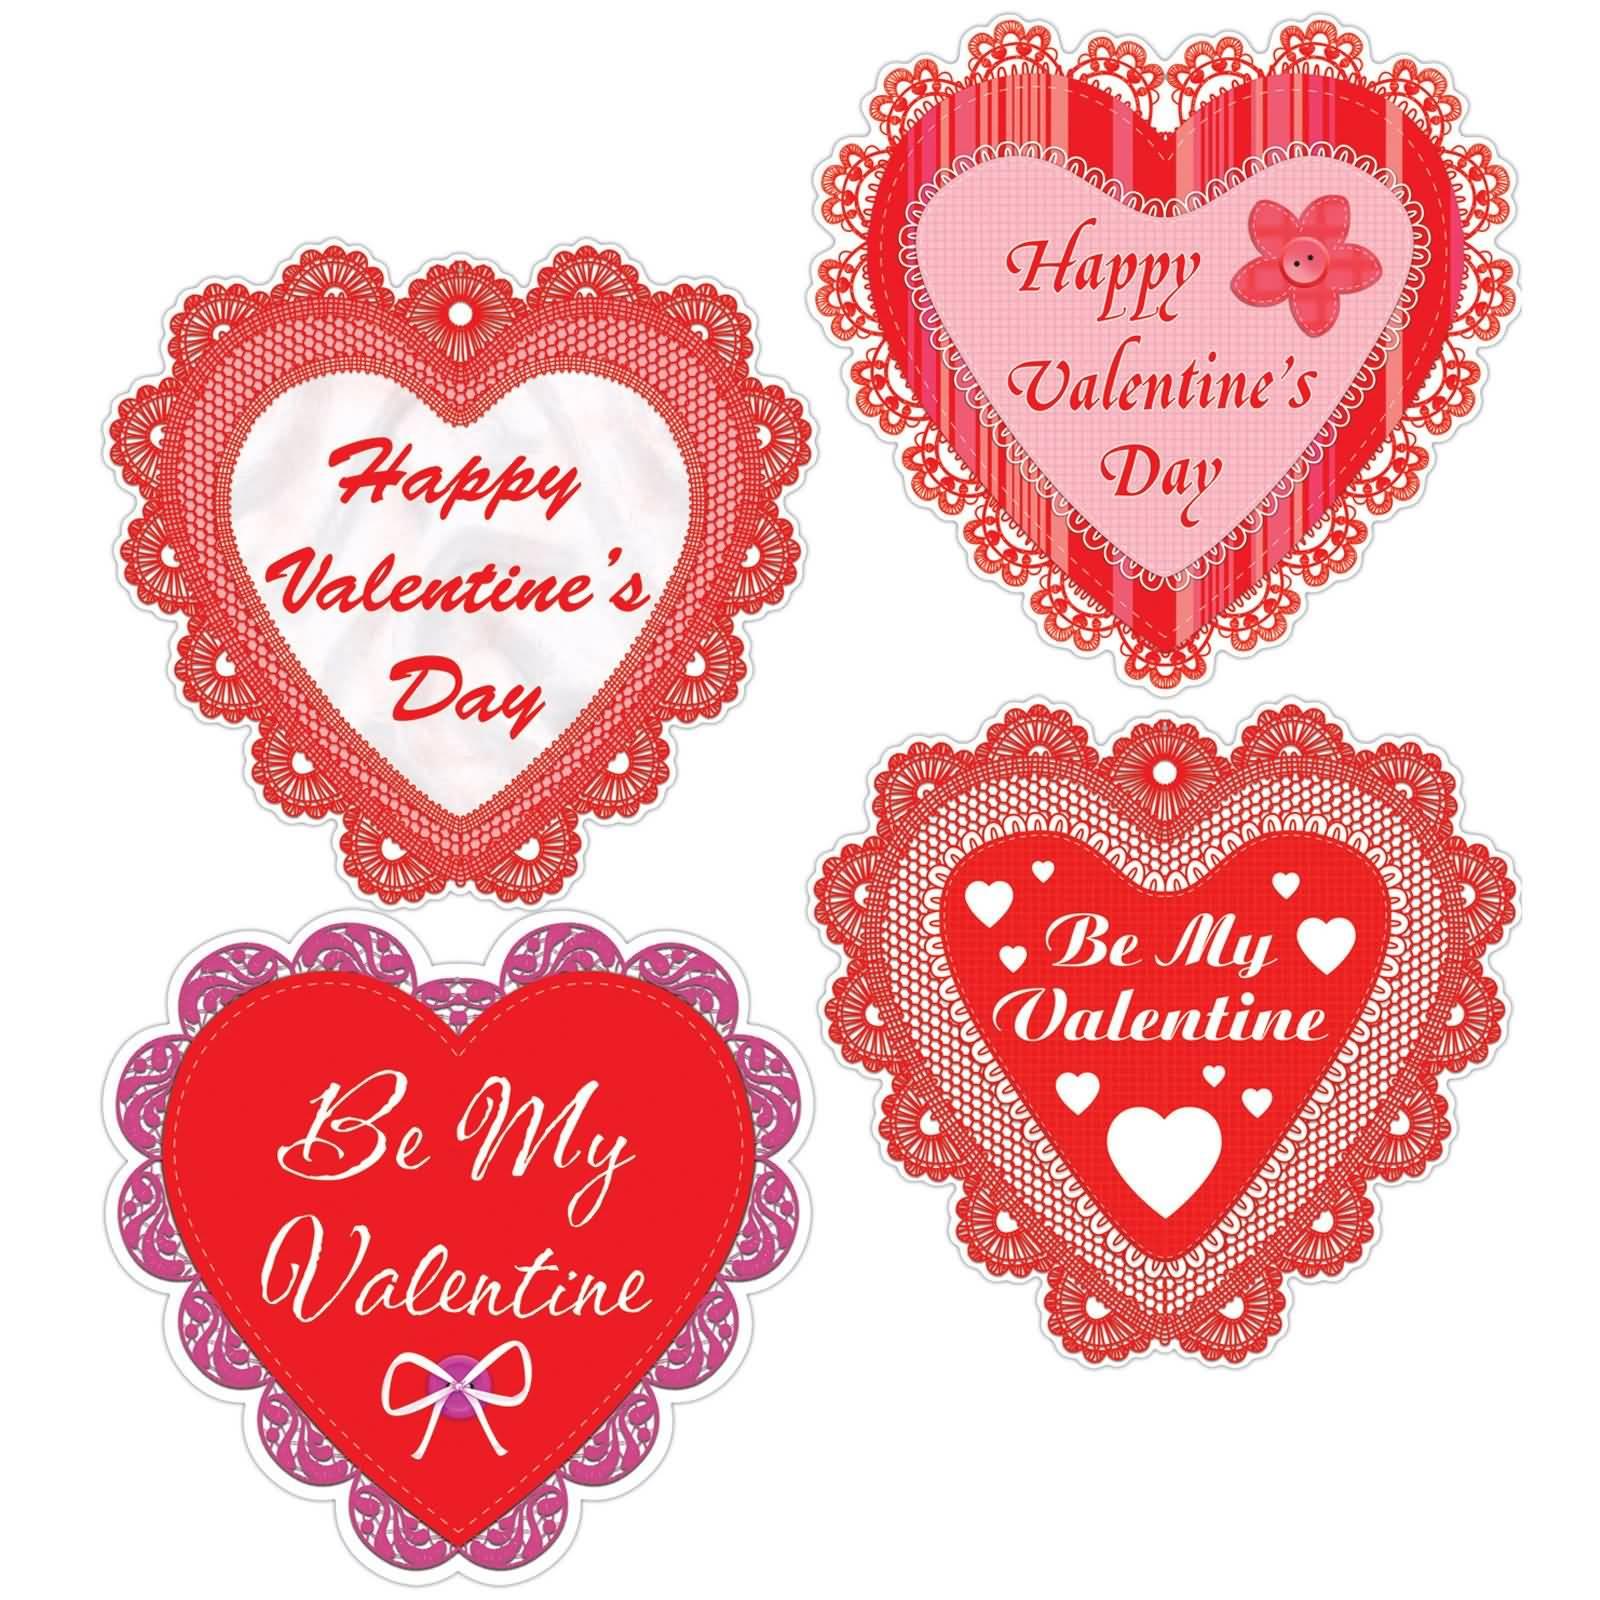 Be mine valentine heart clipart jpg free download Happy Valentine\'s Day Be My Valentine Hearts Clipart jpg free download